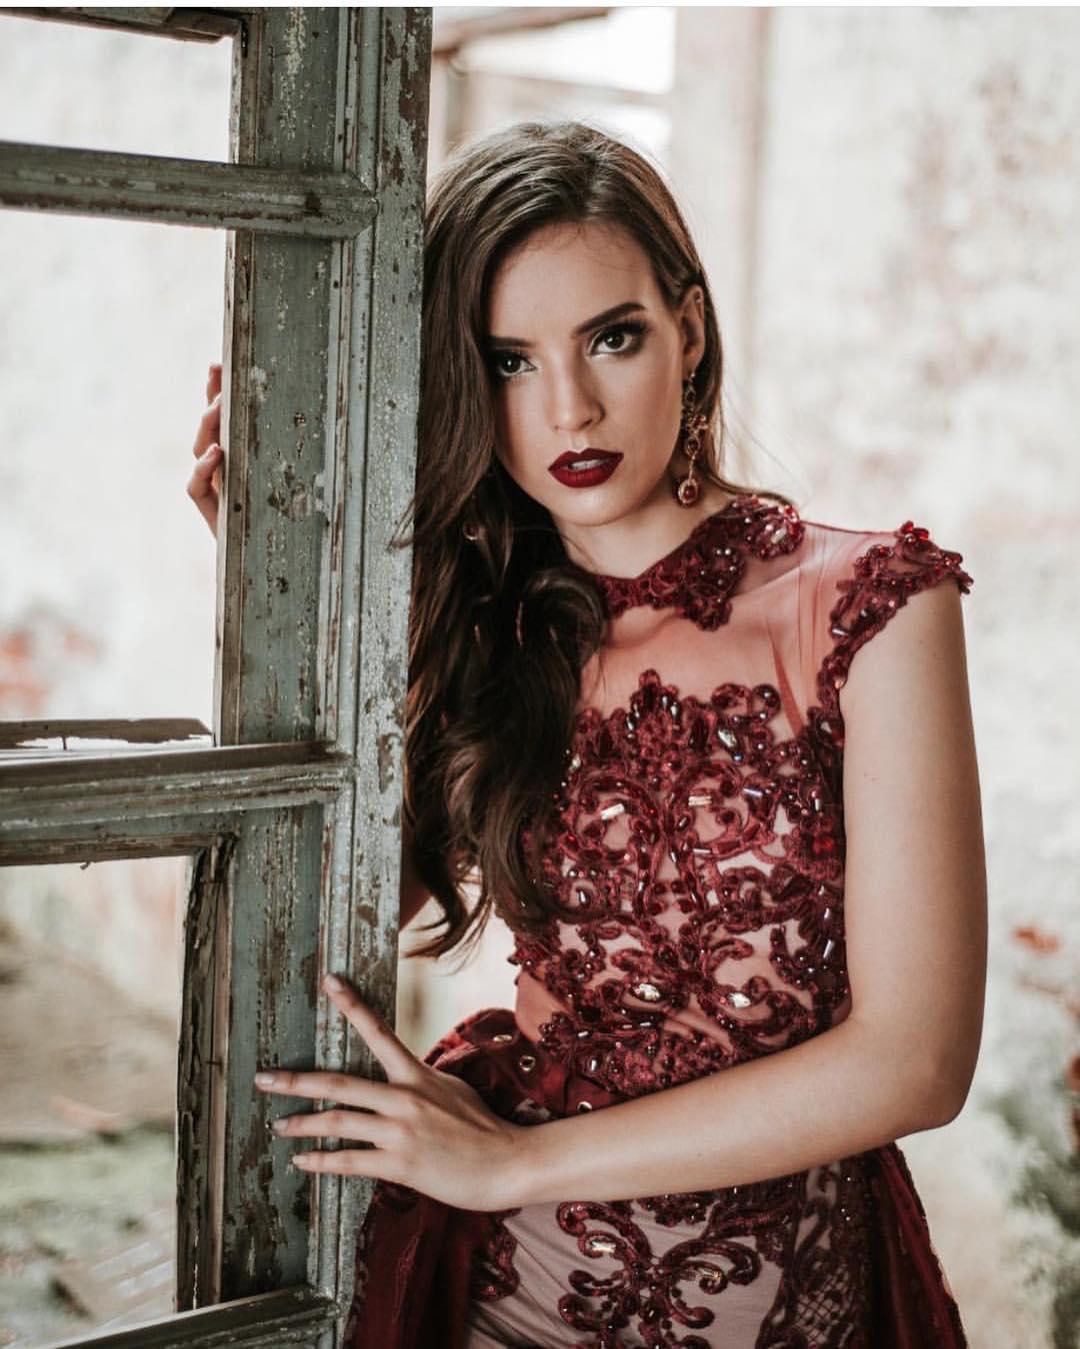 vanessa ponce de leon, miss world 2018. I - Página 4 42661411